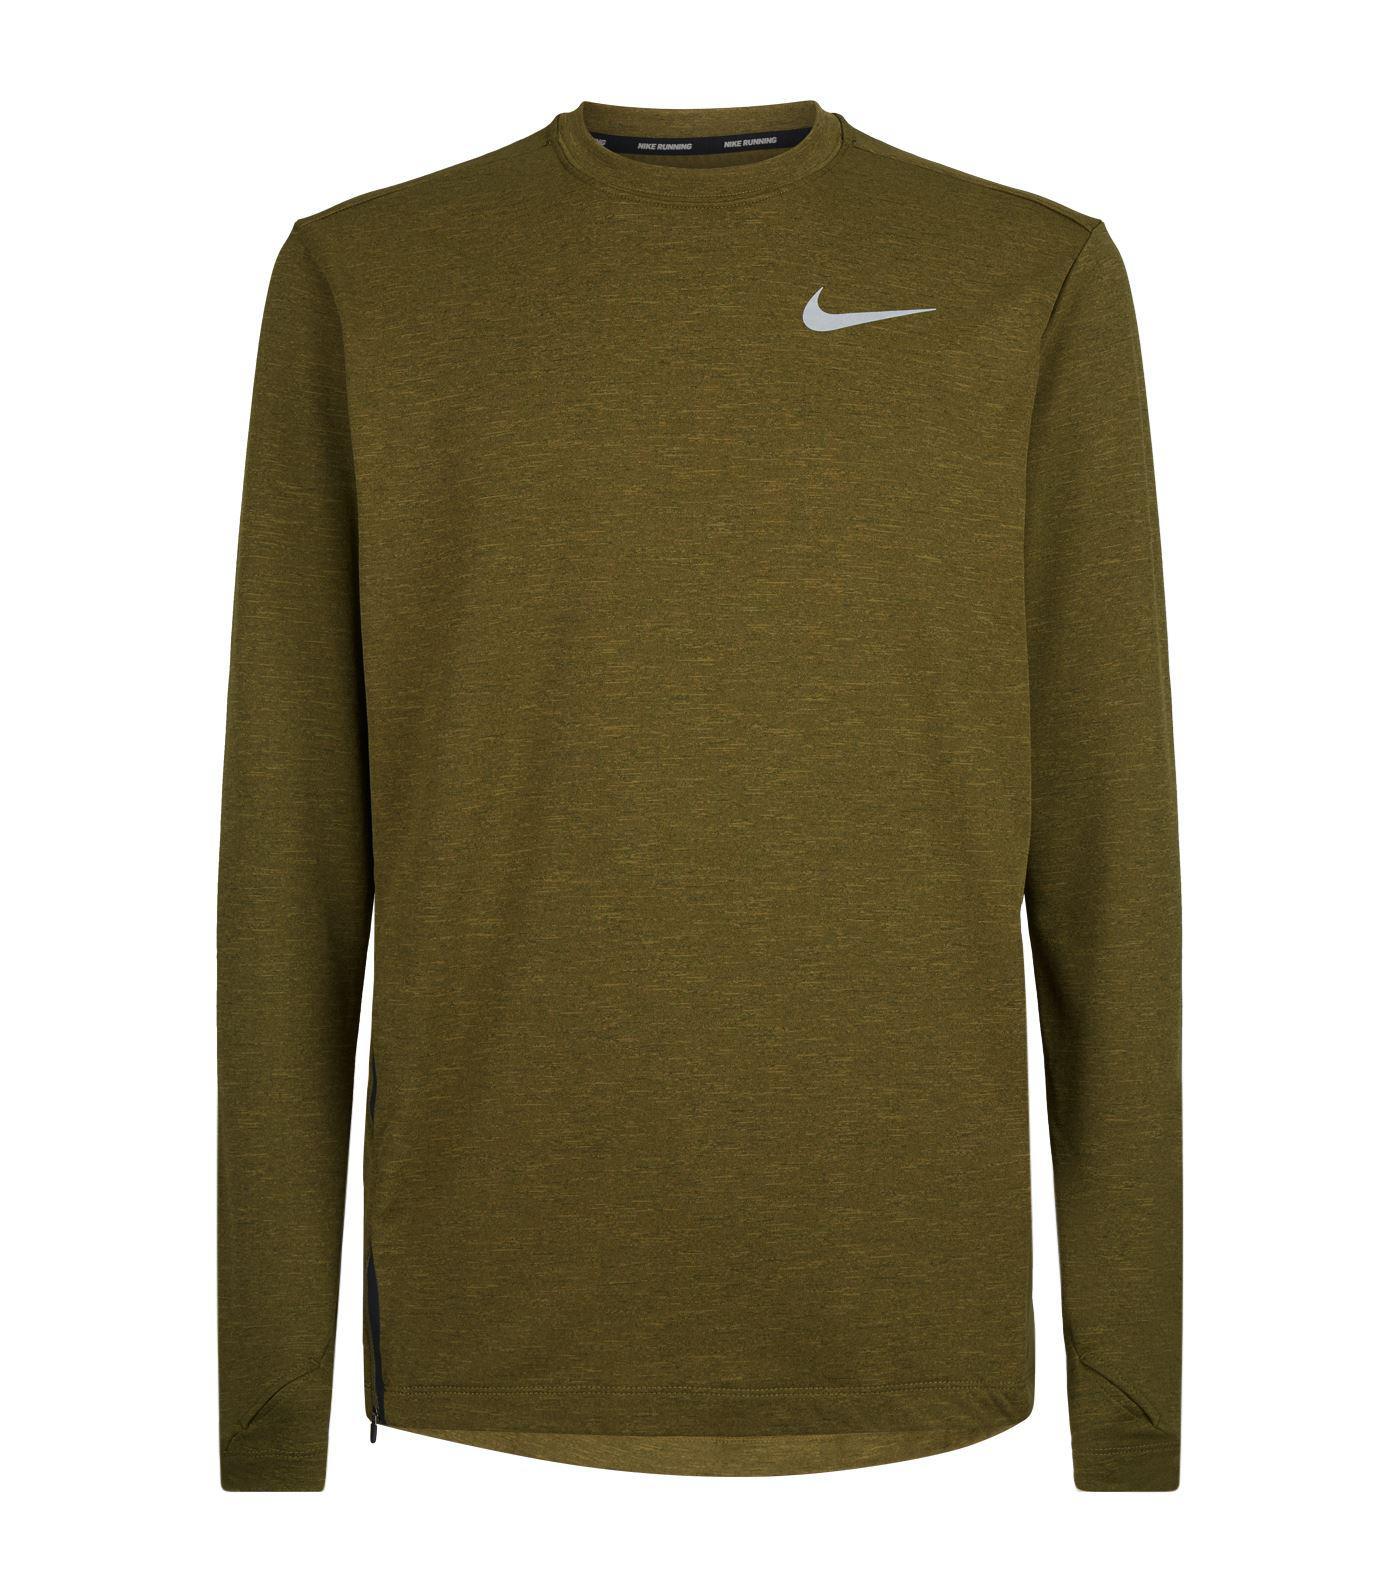 8317d121 Lyst - Nike Sphere Element 2.0 T-shirt in Green for Men